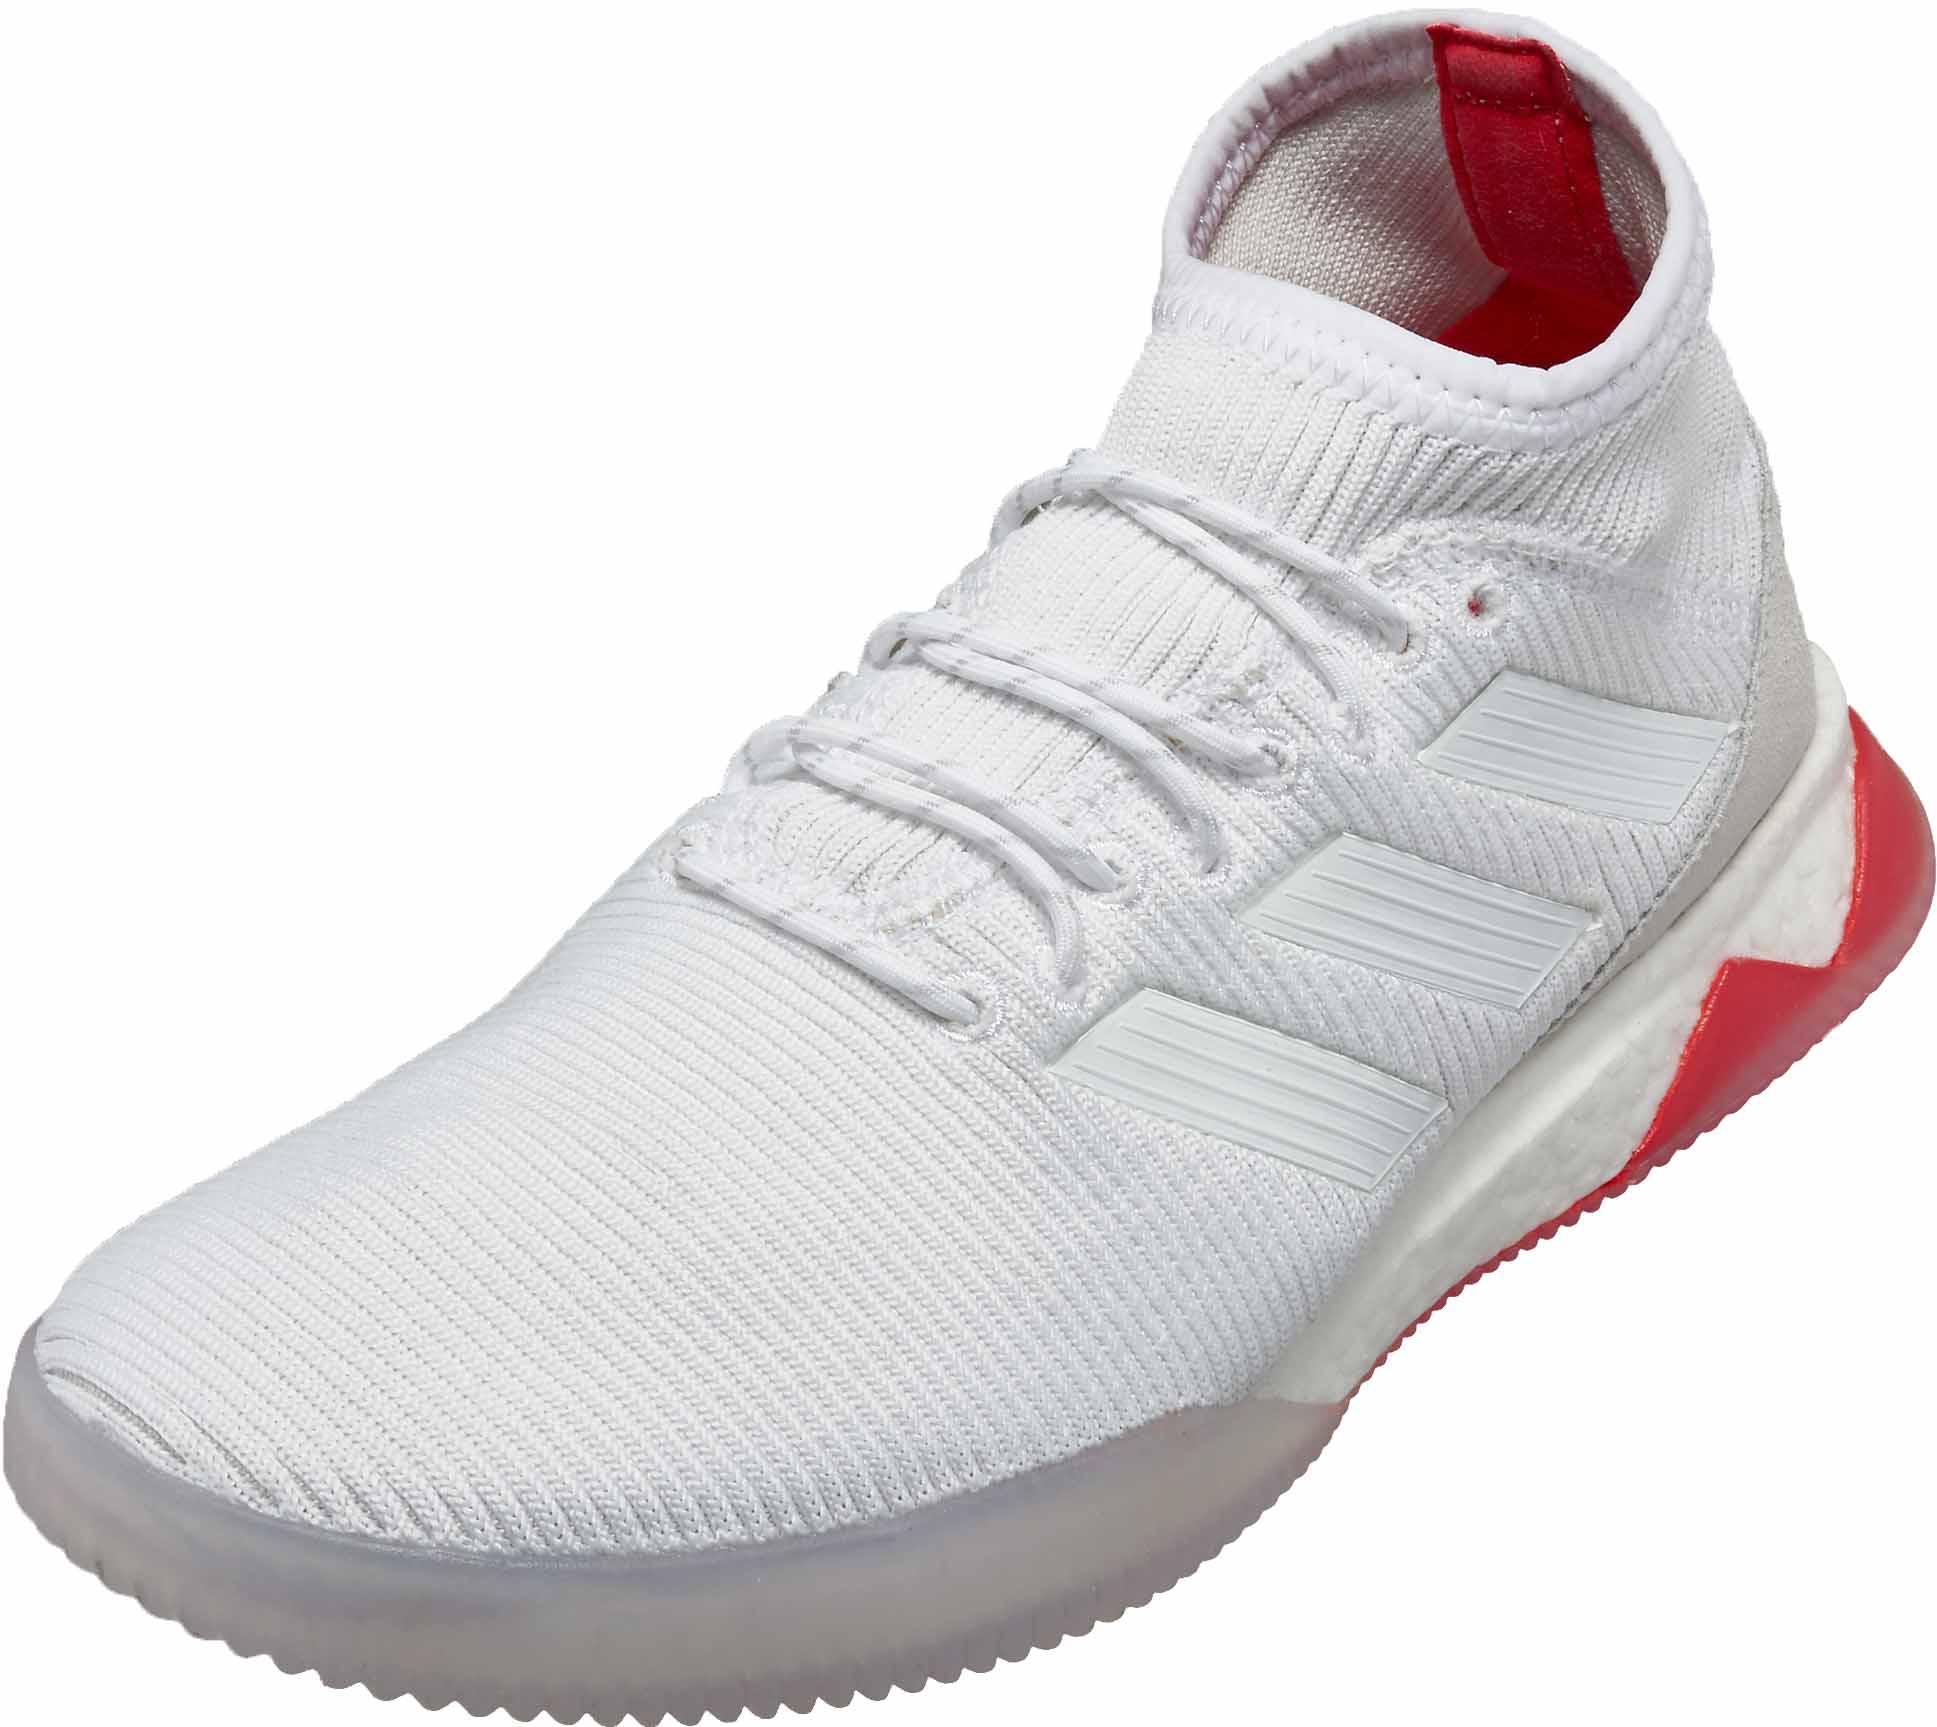 adidas Predator Tango 18.1 TR – WhiteReal Coral